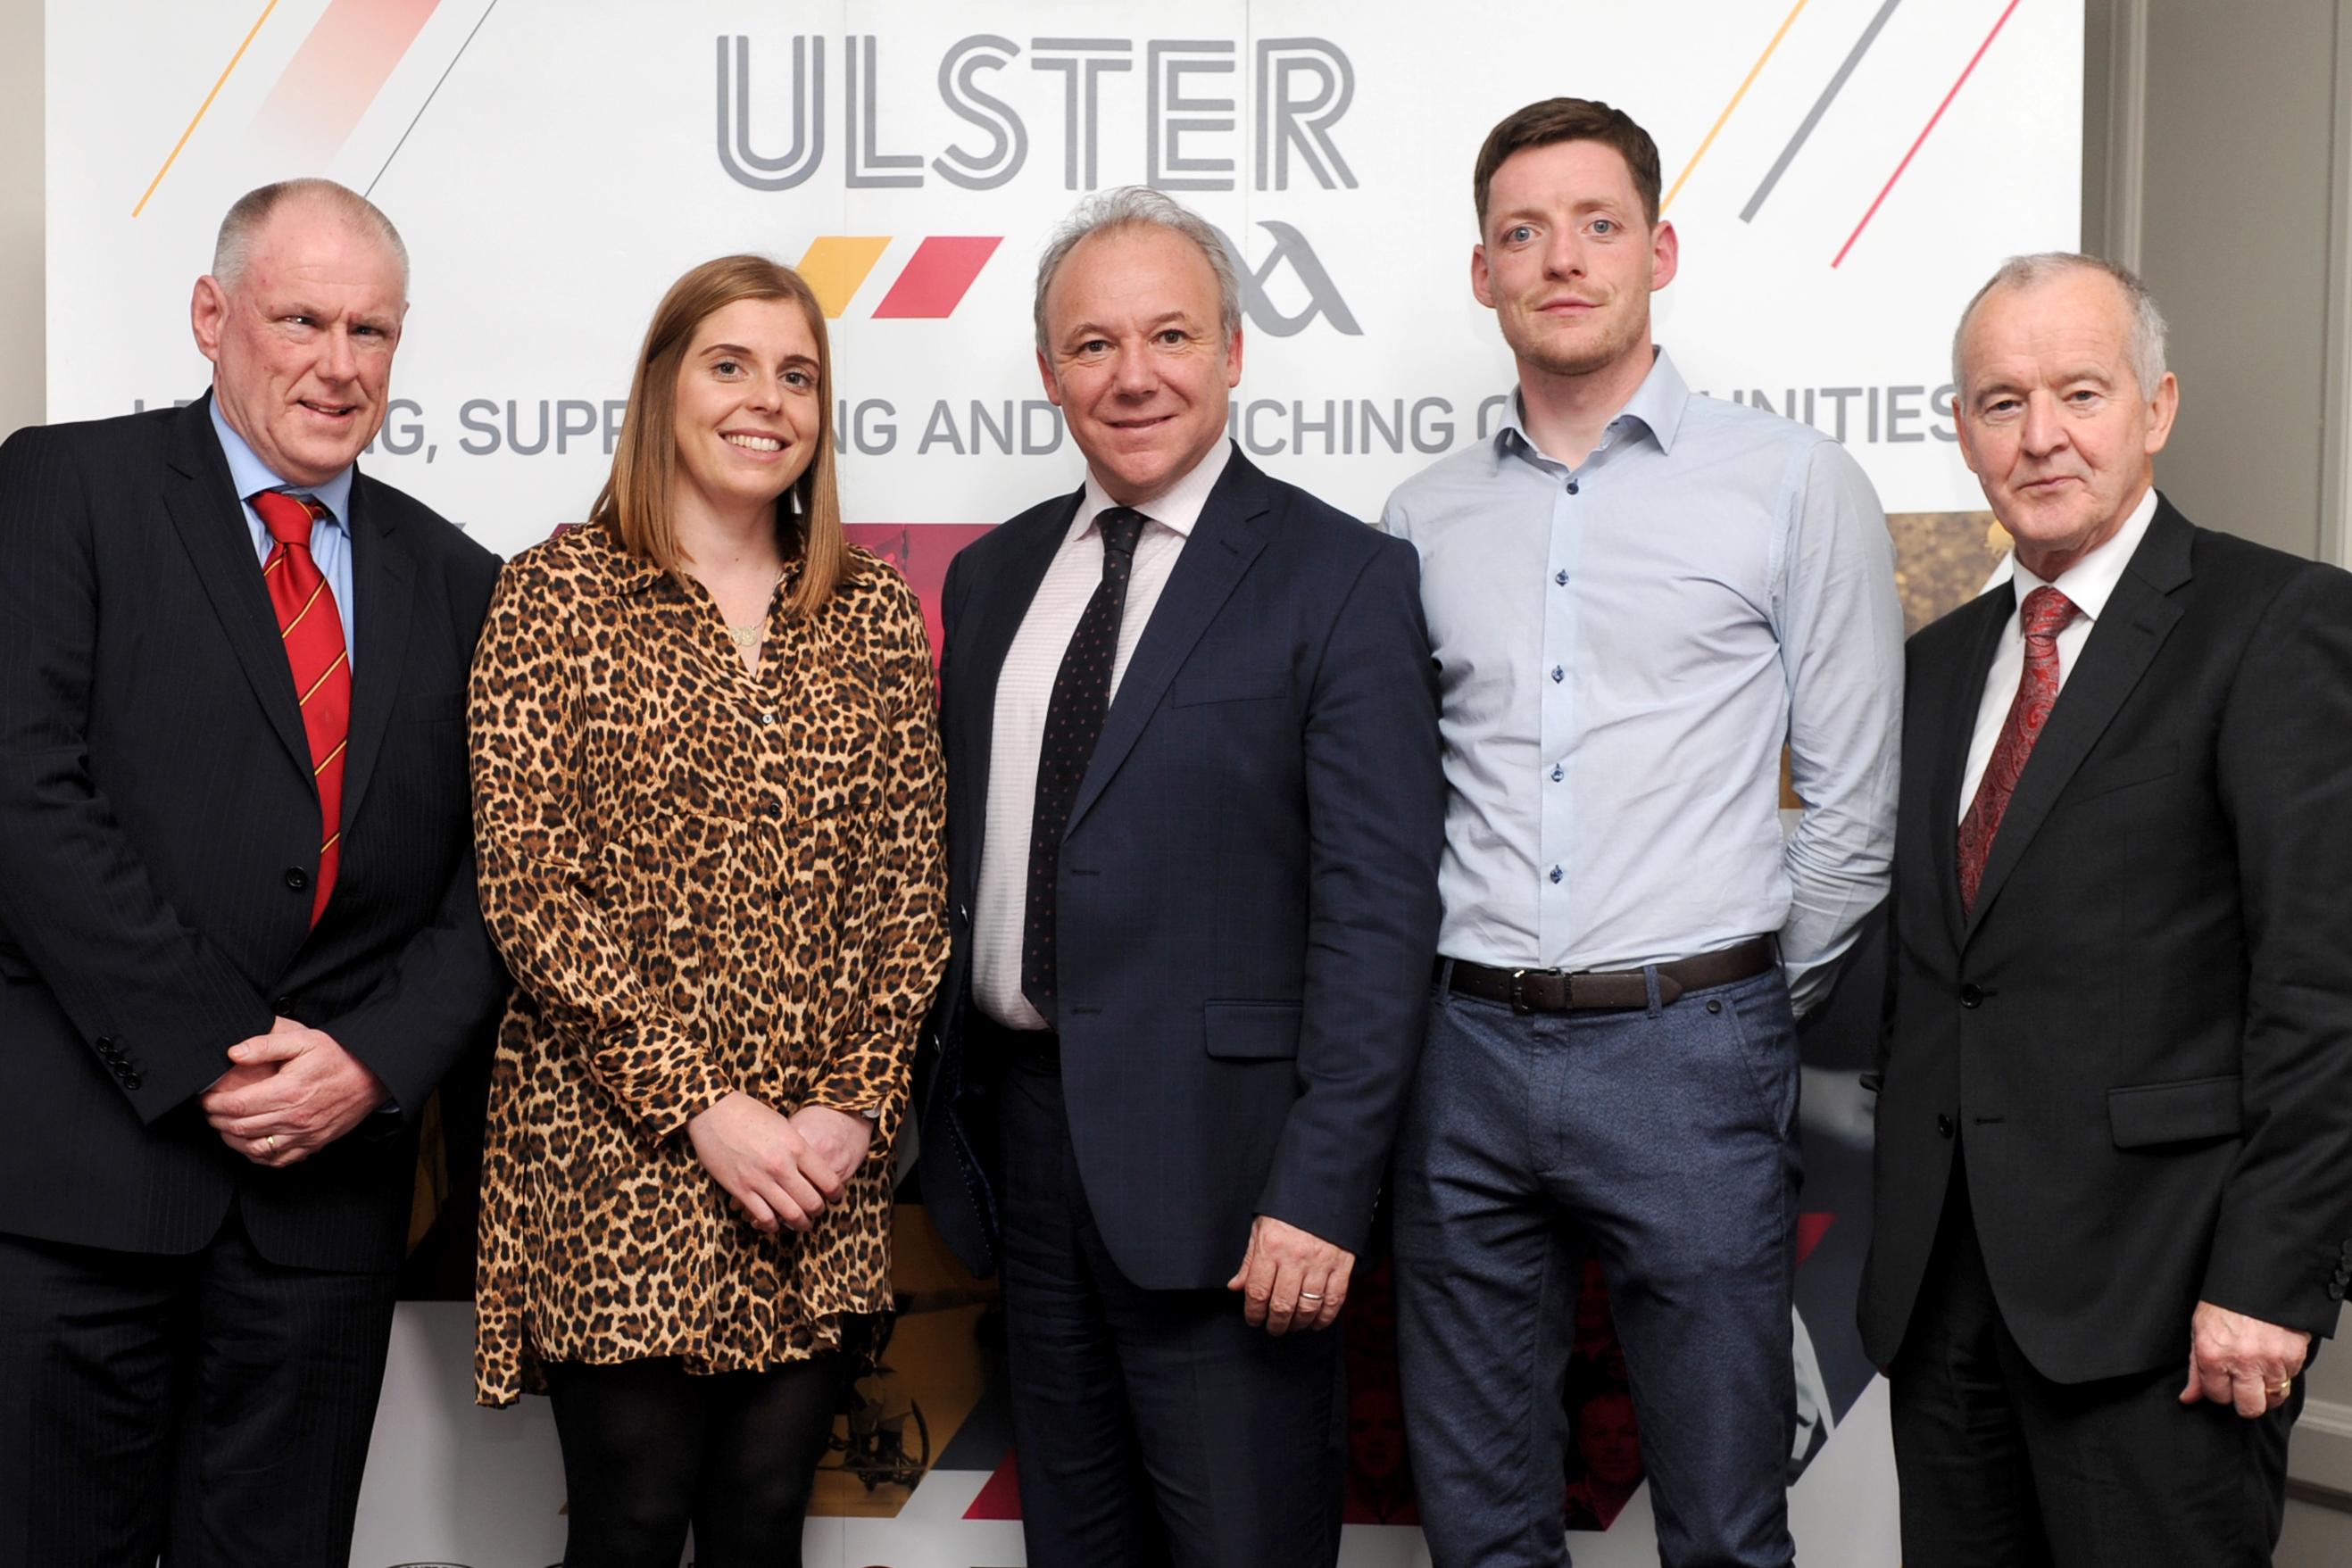 Ulster GAA hosts successful Sponsors Evening